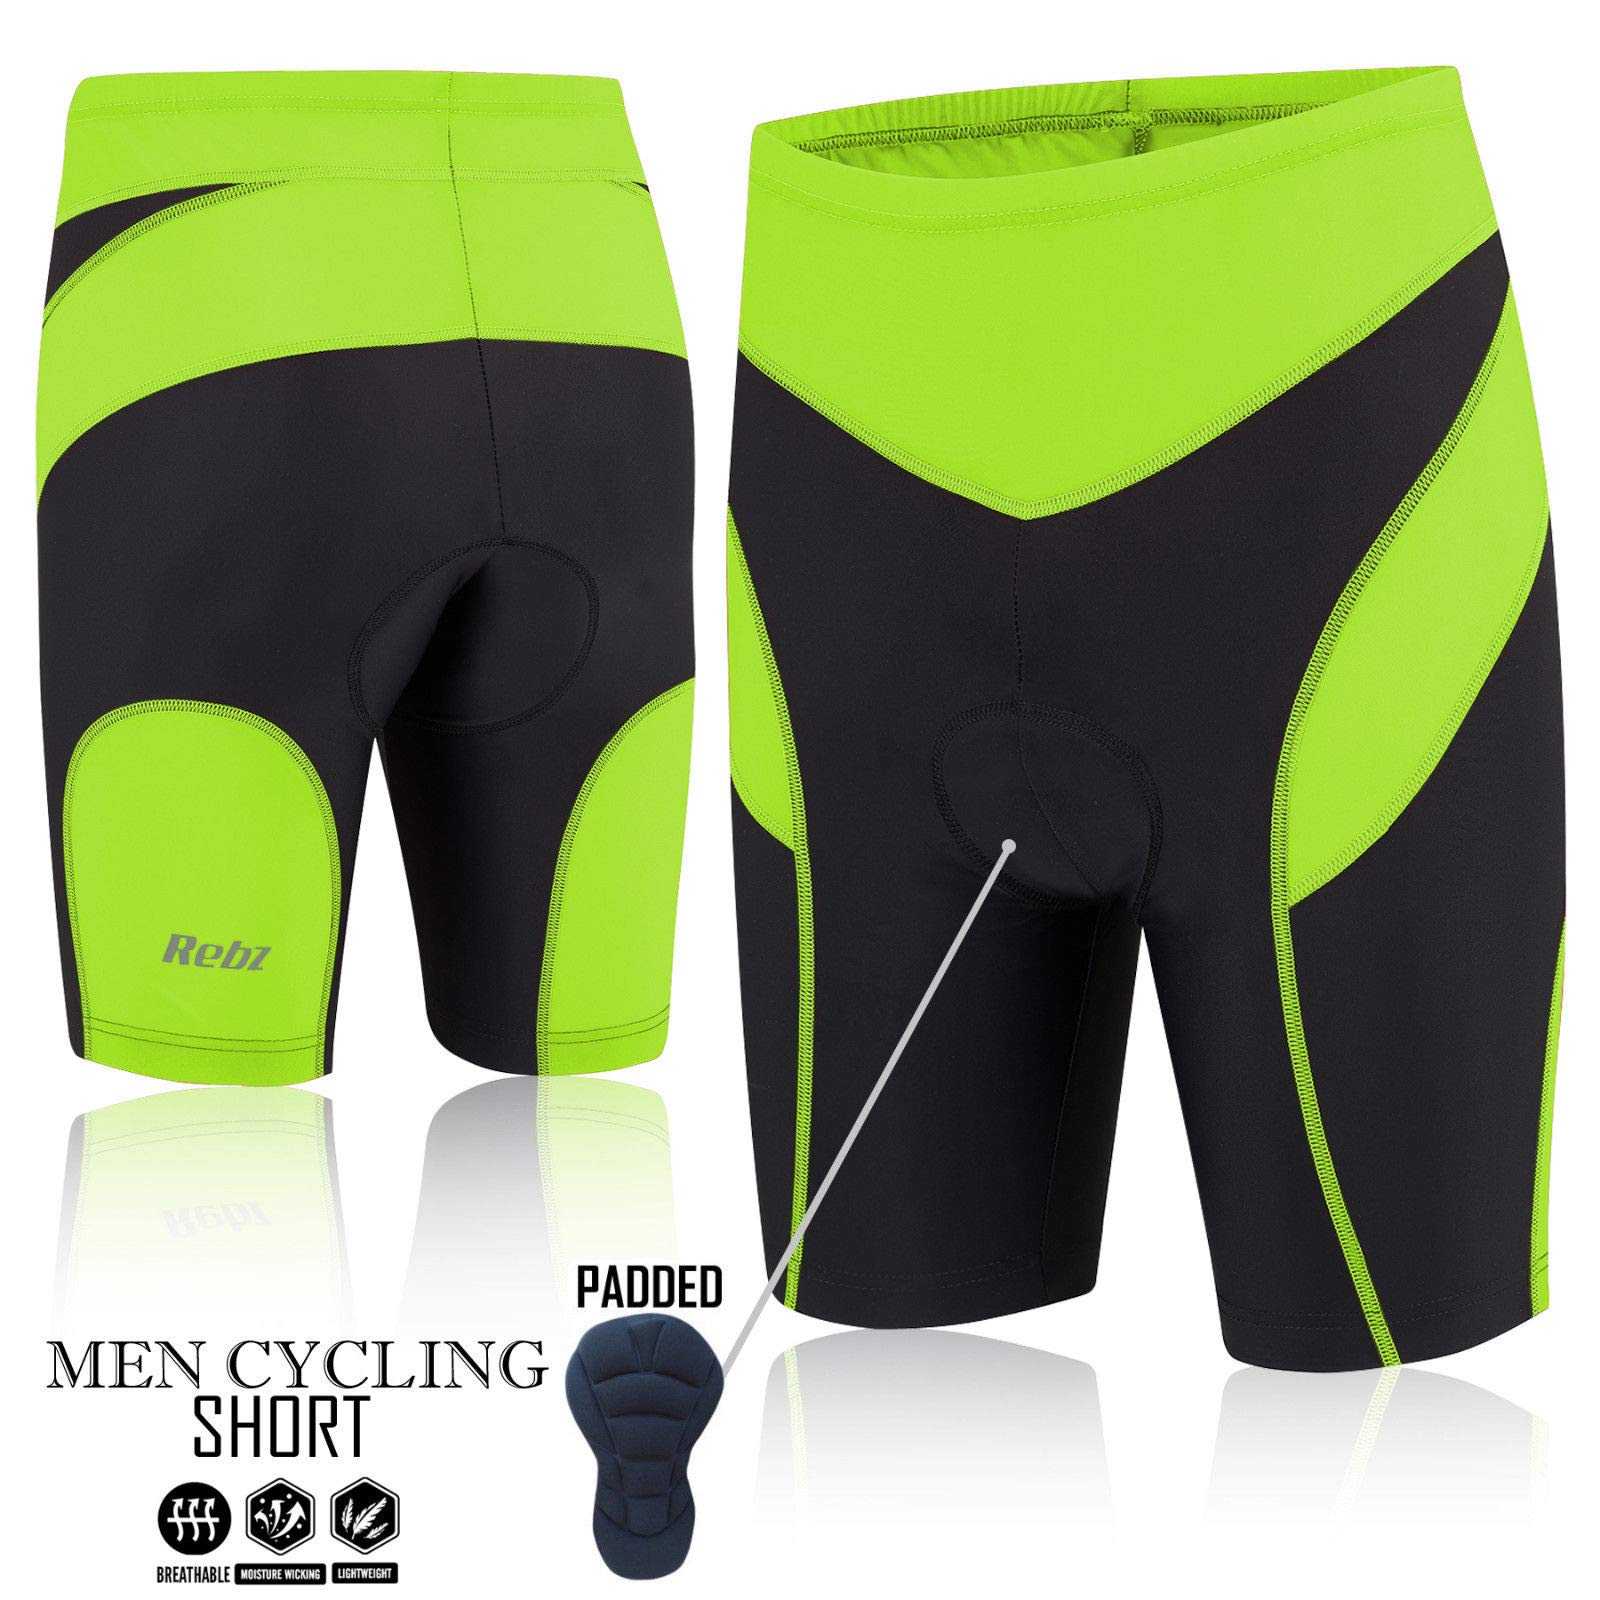 REBZ Mens Performance Cycling Bib Shorts Coolmax Padded Bicycle Short